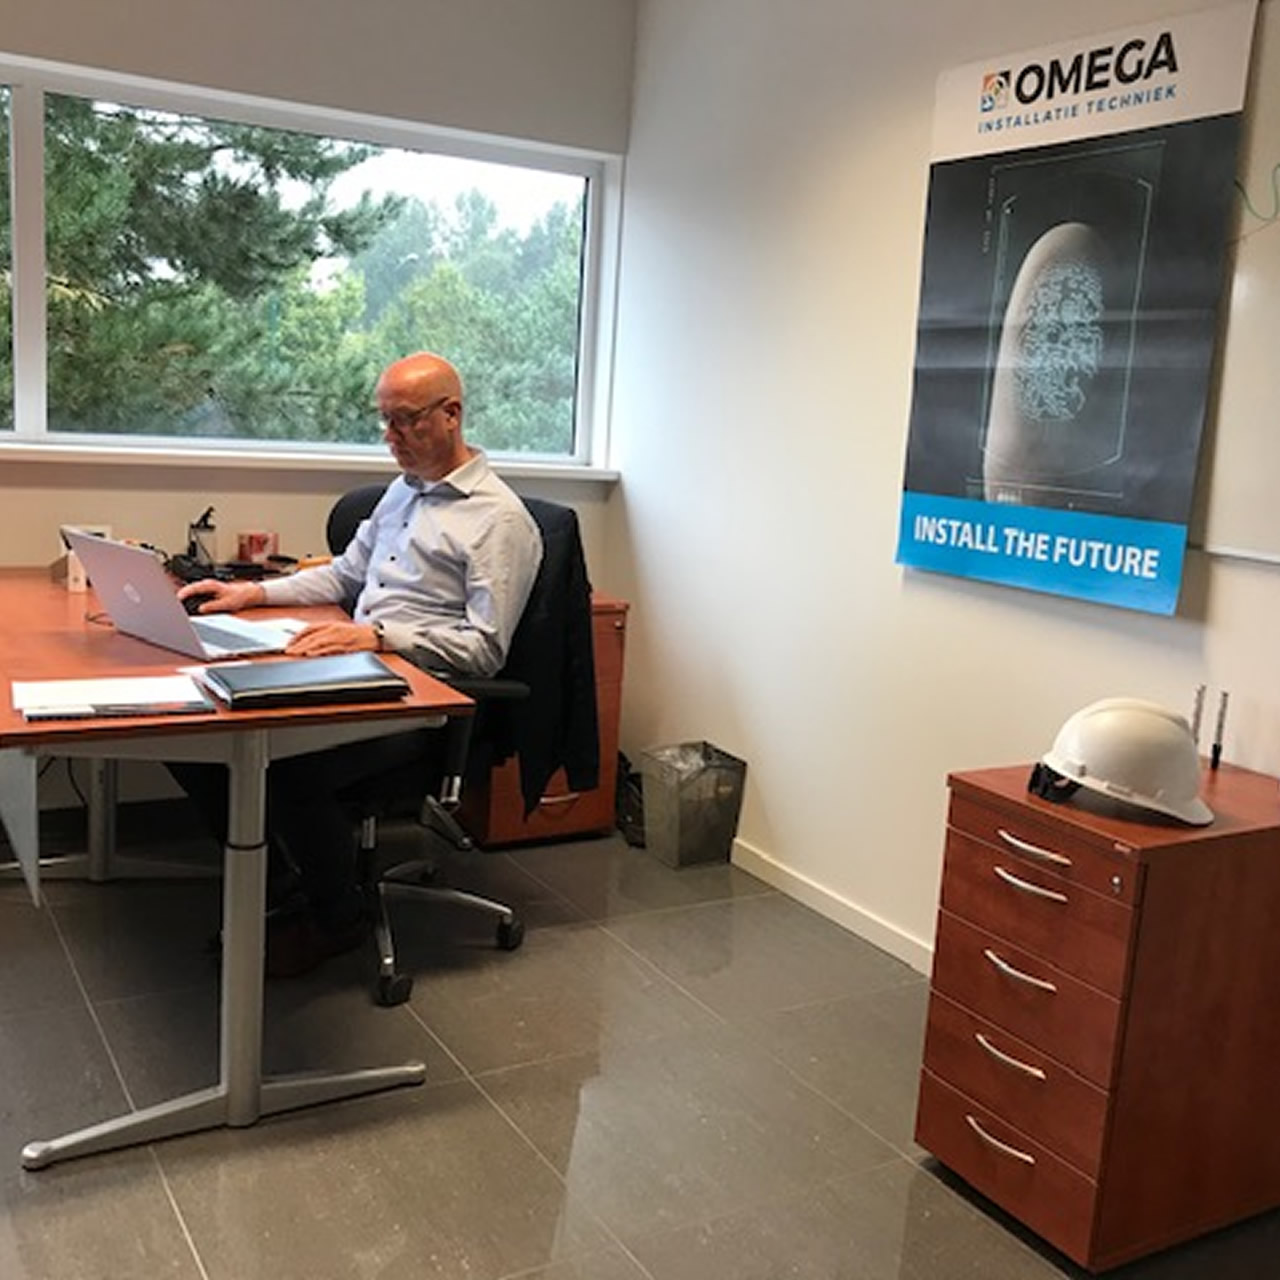 Omega IT - Rolf Lemmens